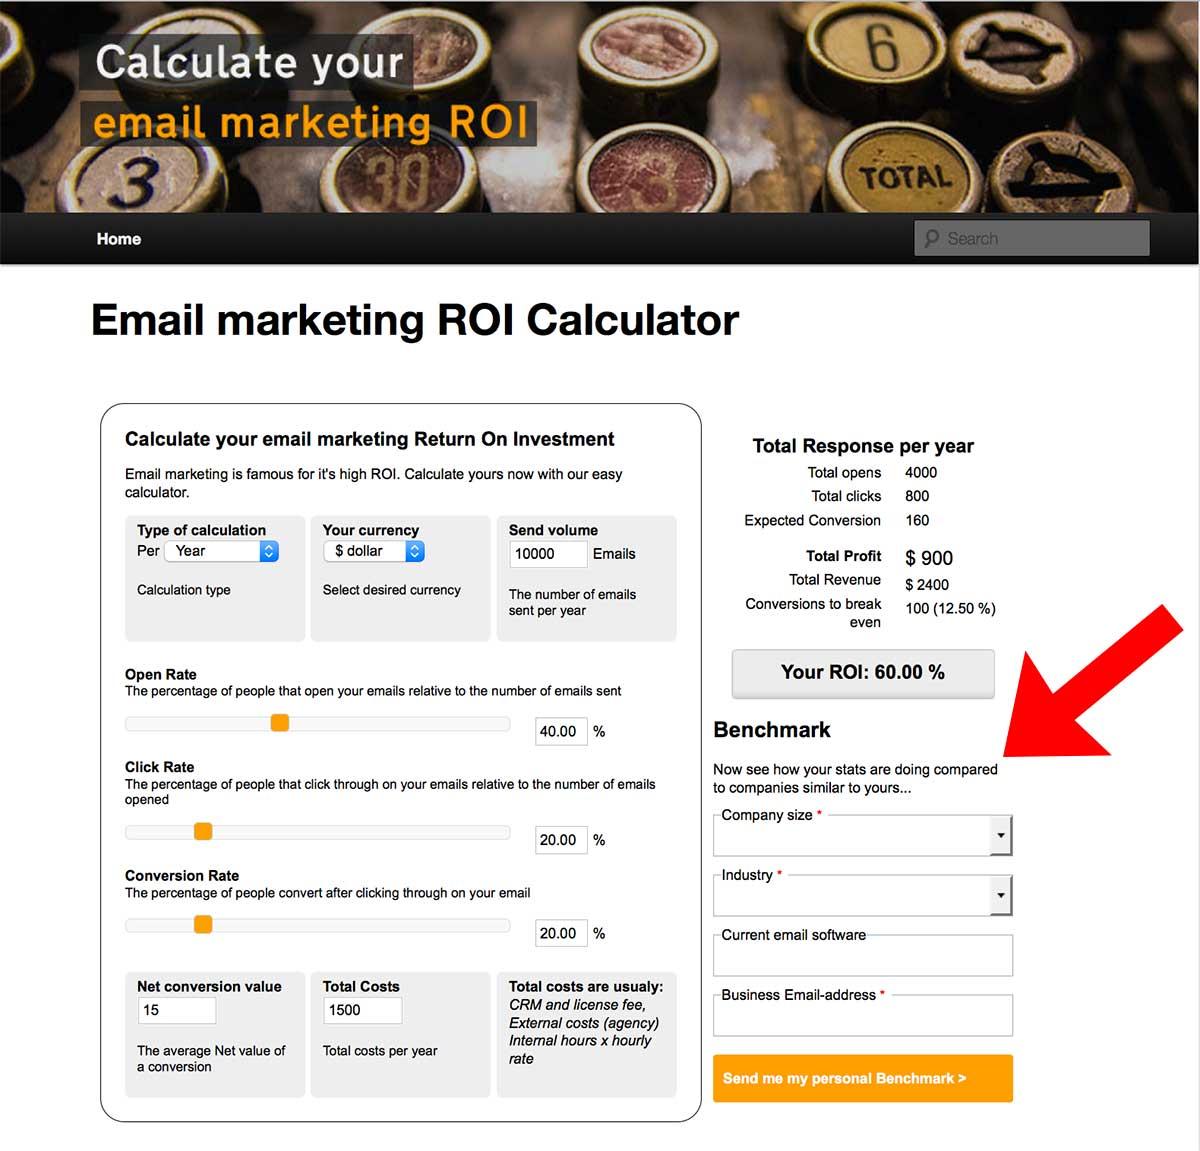 EmailMarketingCalculator